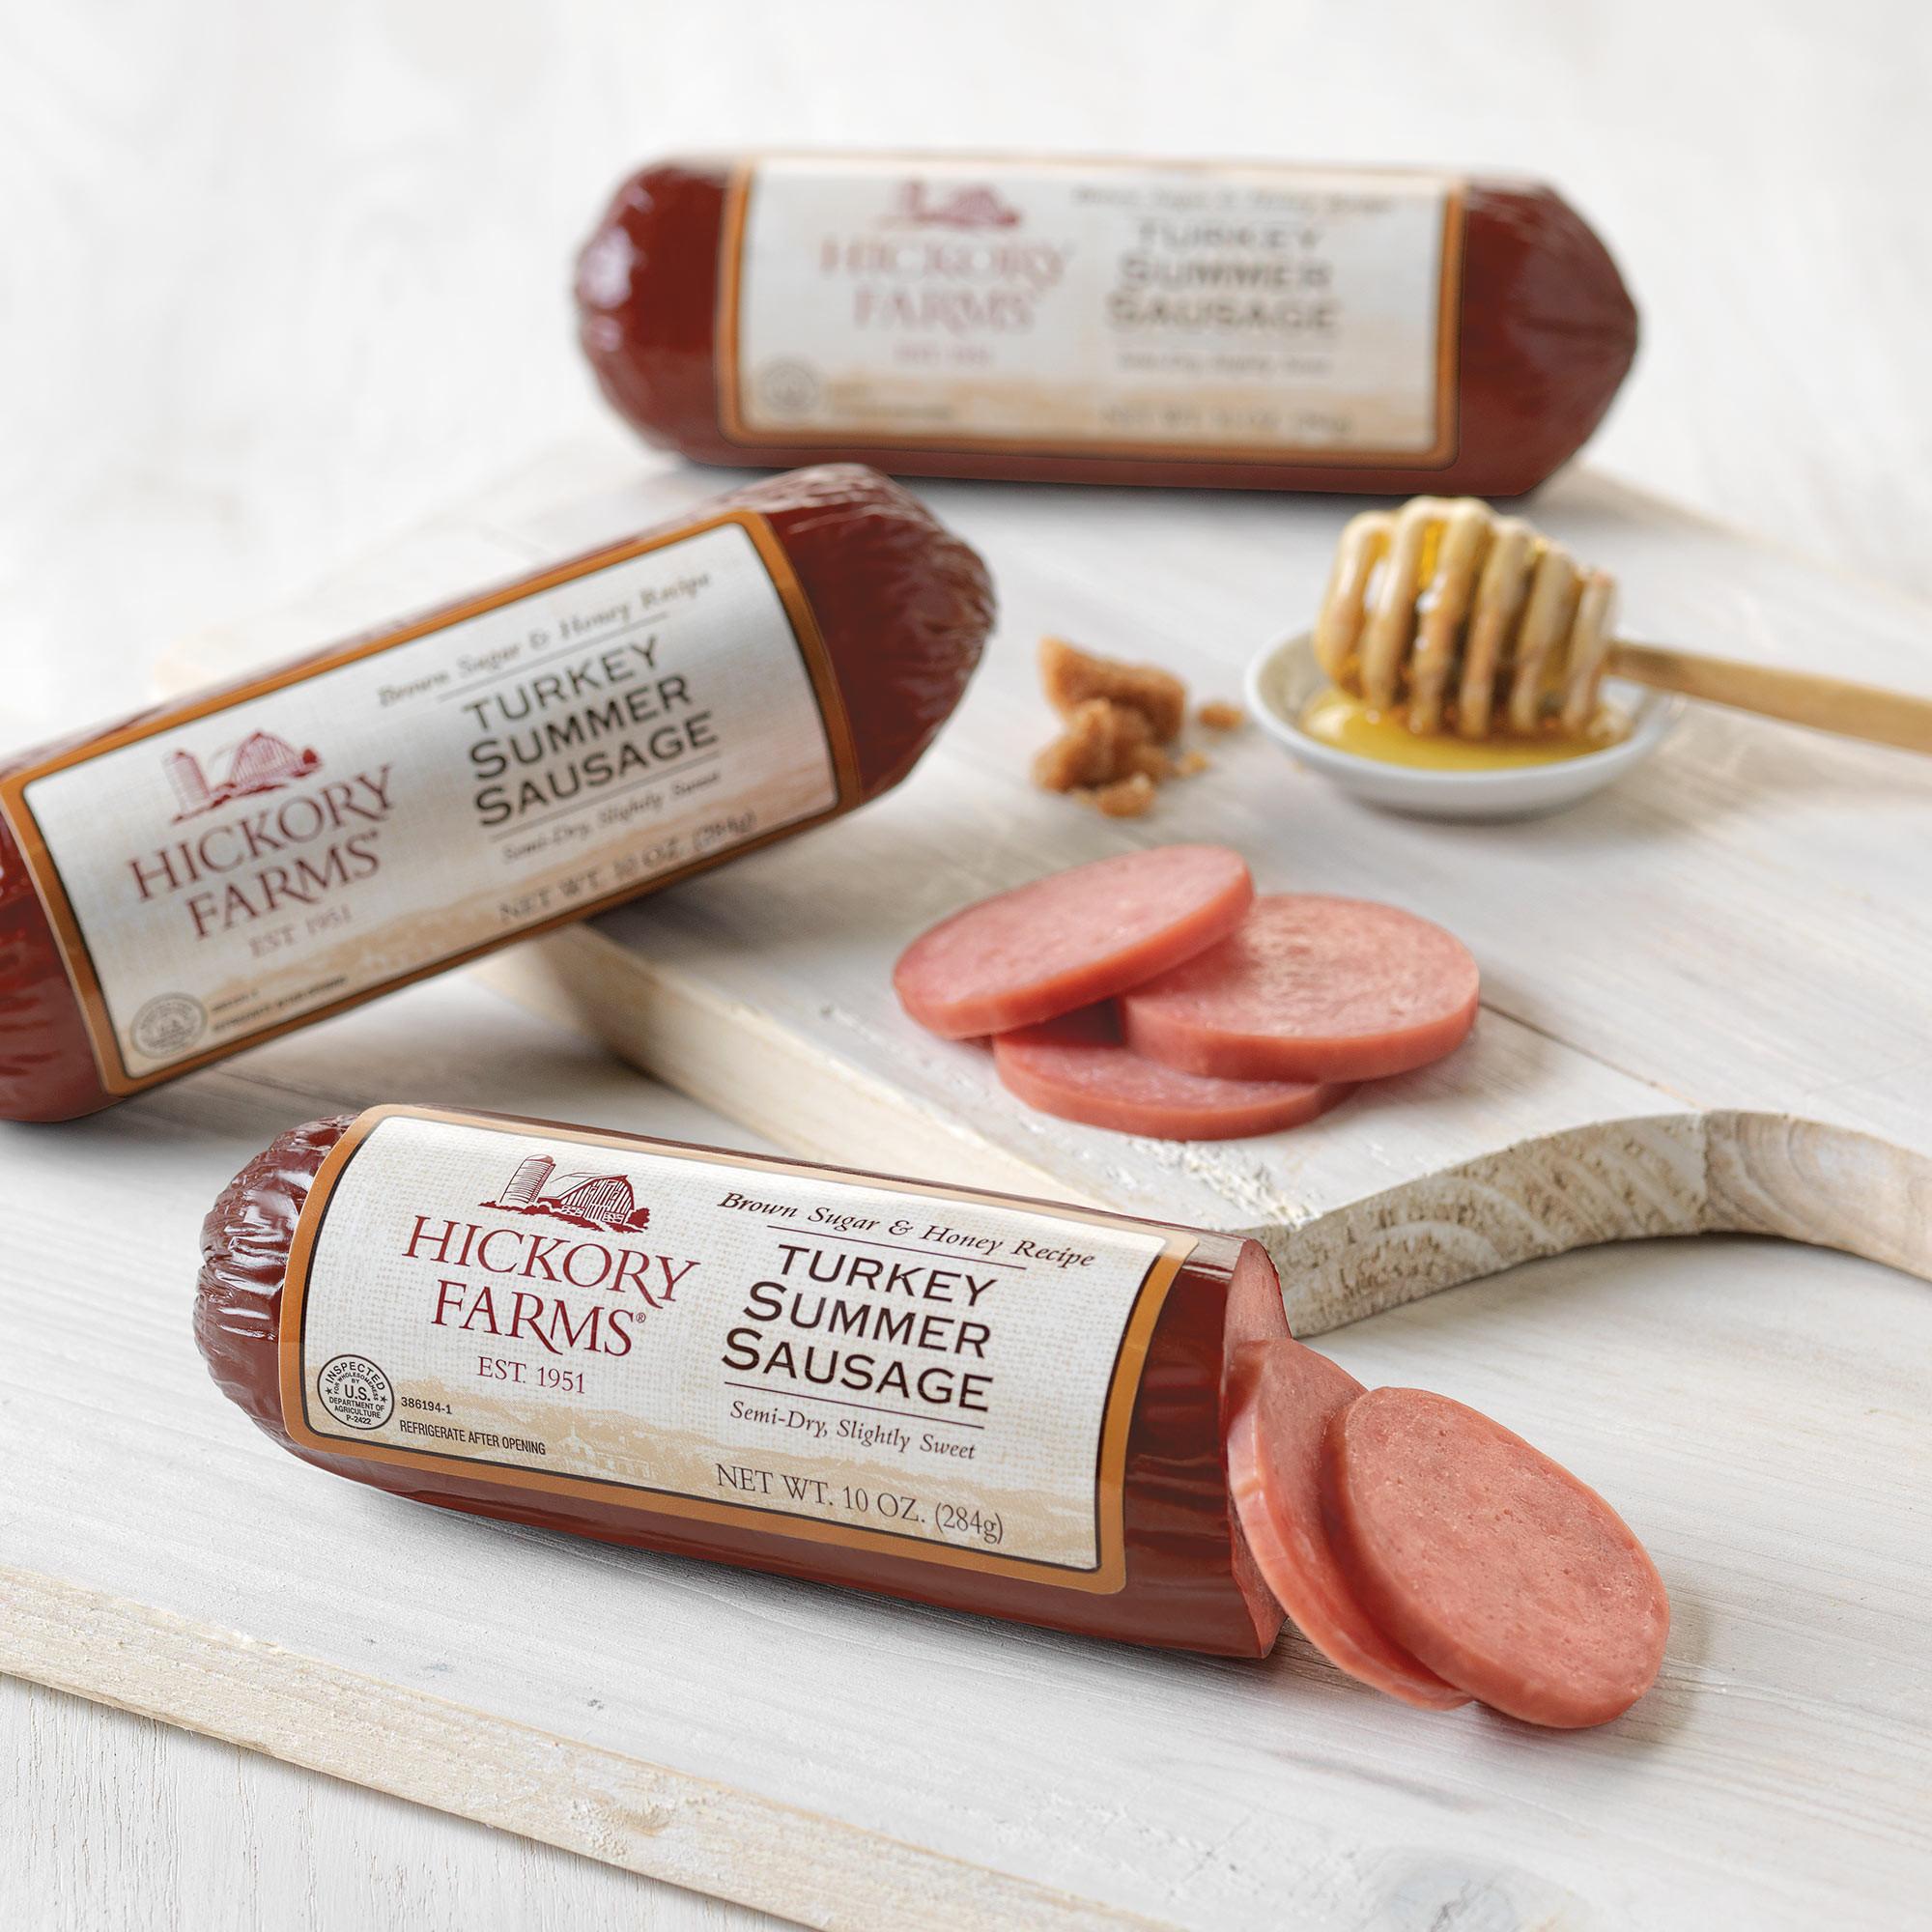 Turkey Summer Sausage  Turkey Summer Sausage 3 Pack Gift